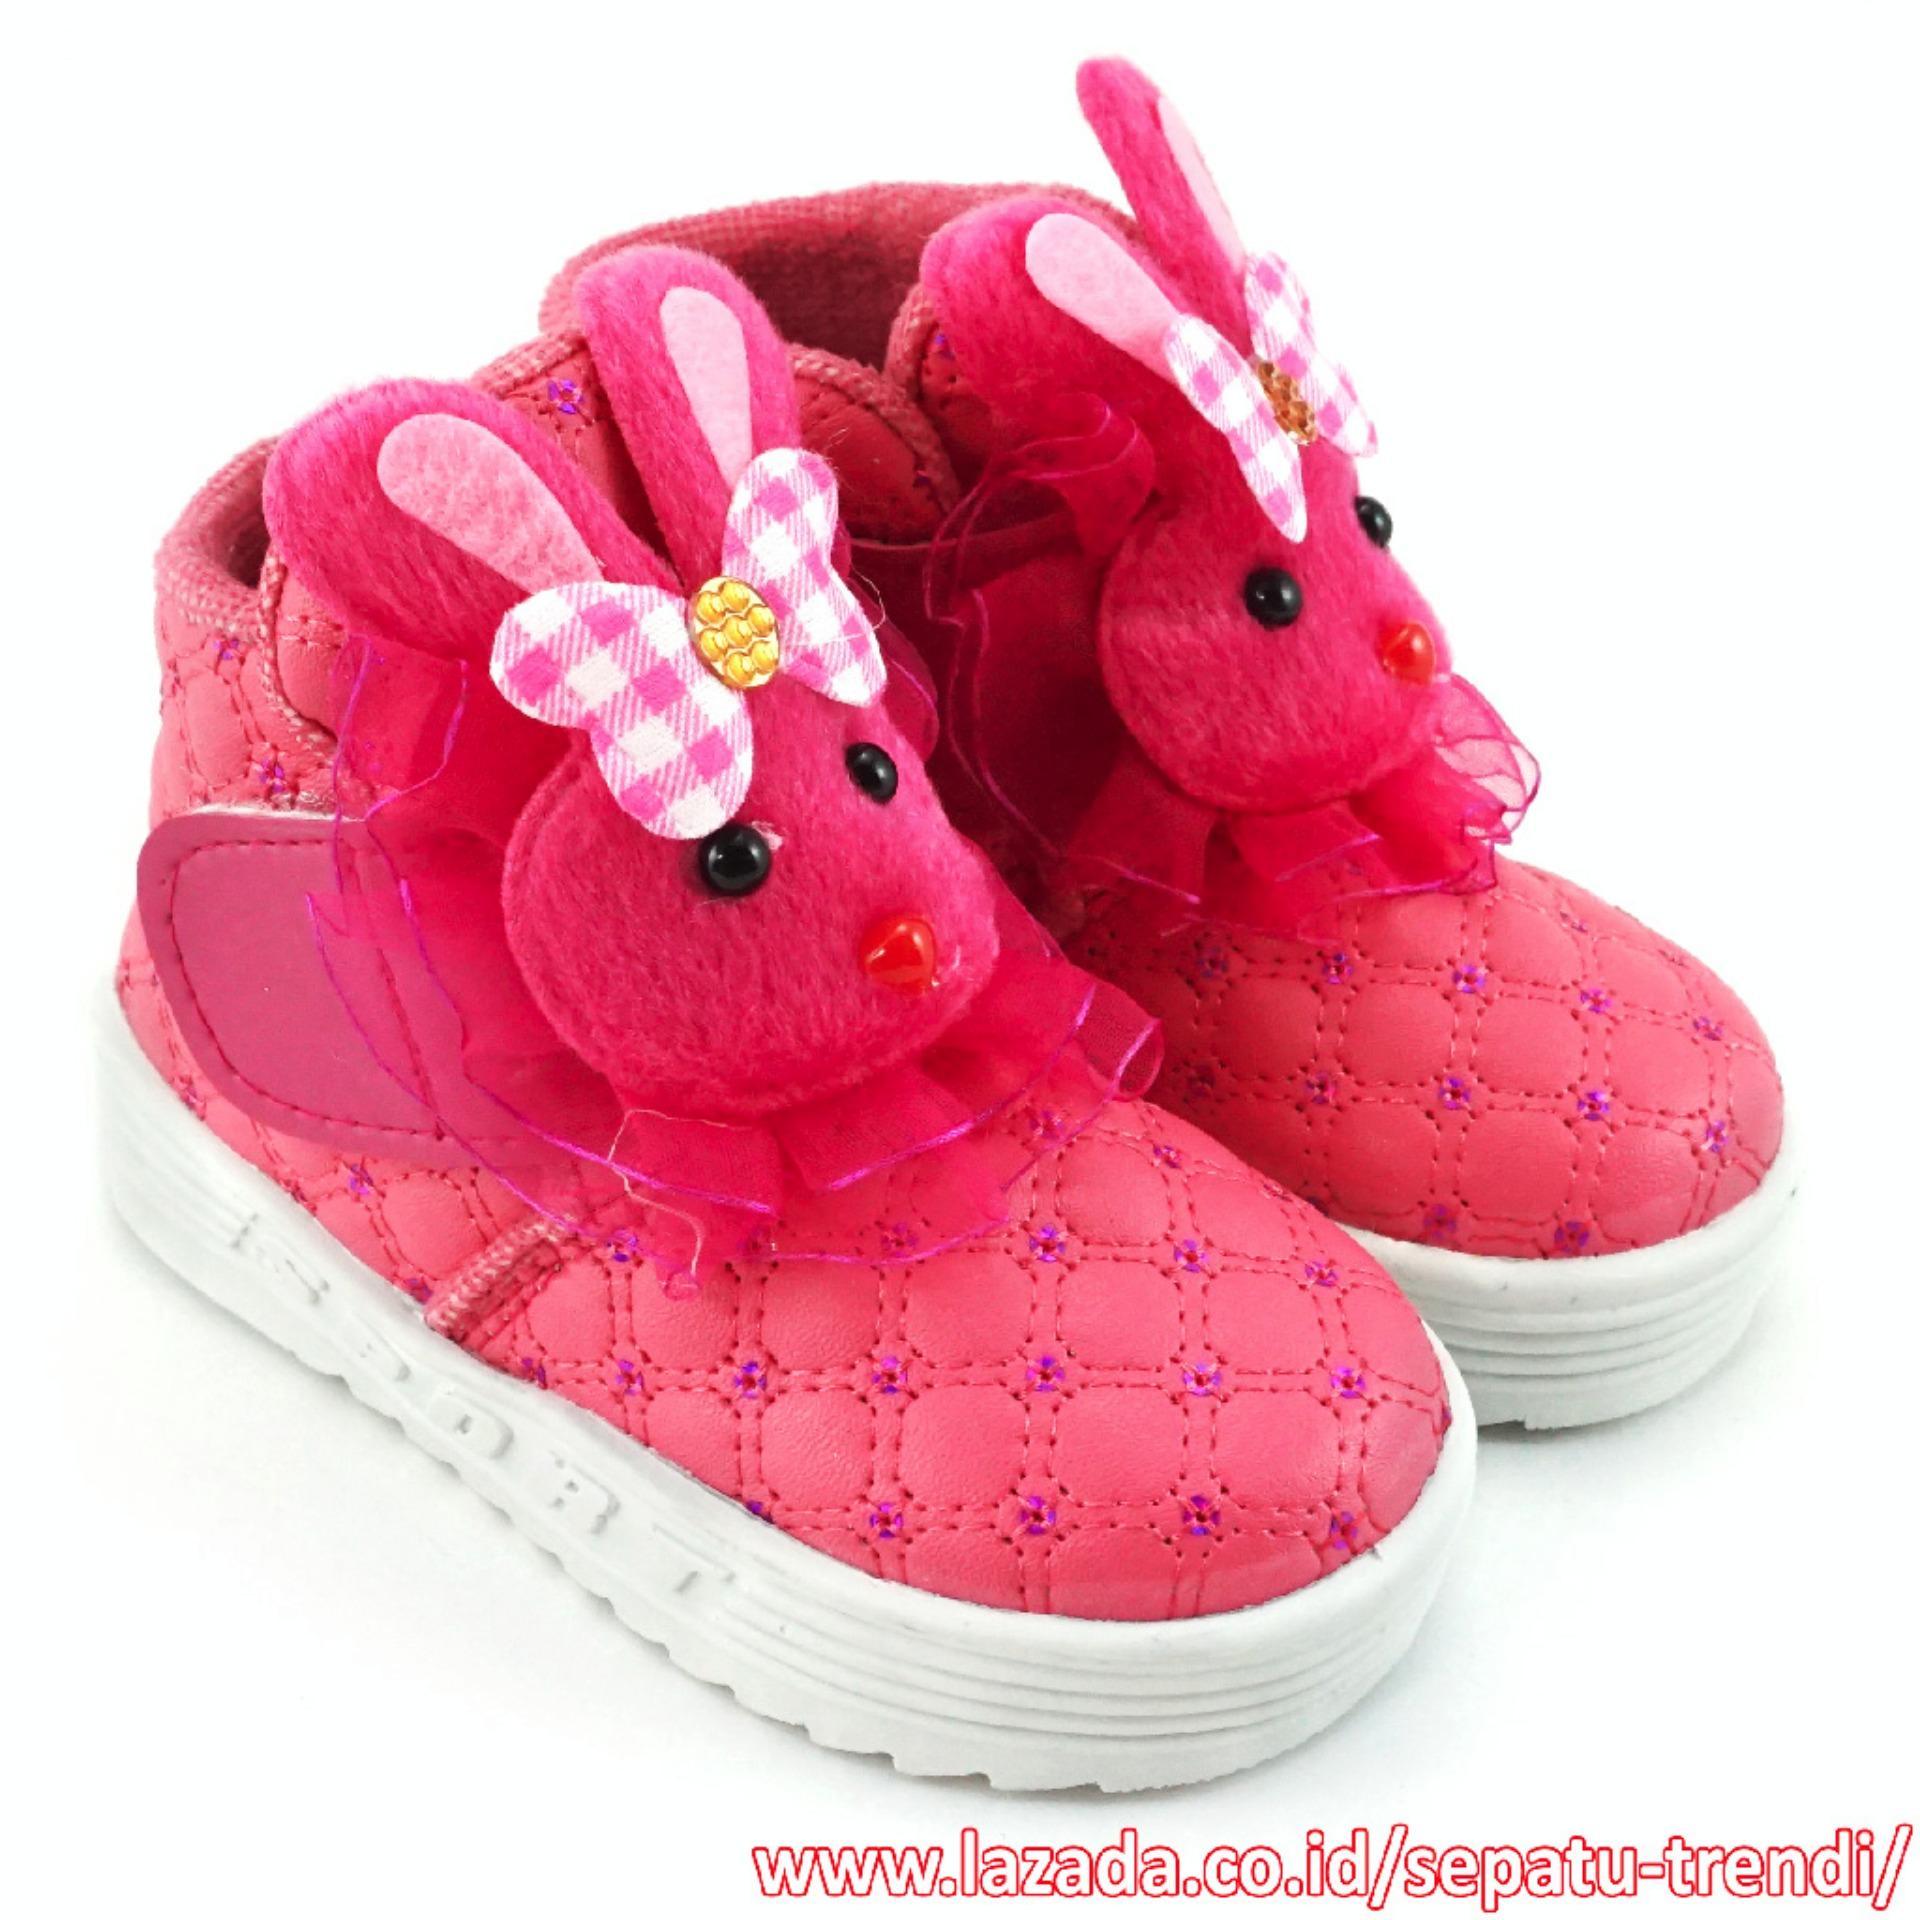 Jual Trendishoes Sepatu Boot Anak Perempuan Boneka Cantik Fuchsia Trendishoes Original